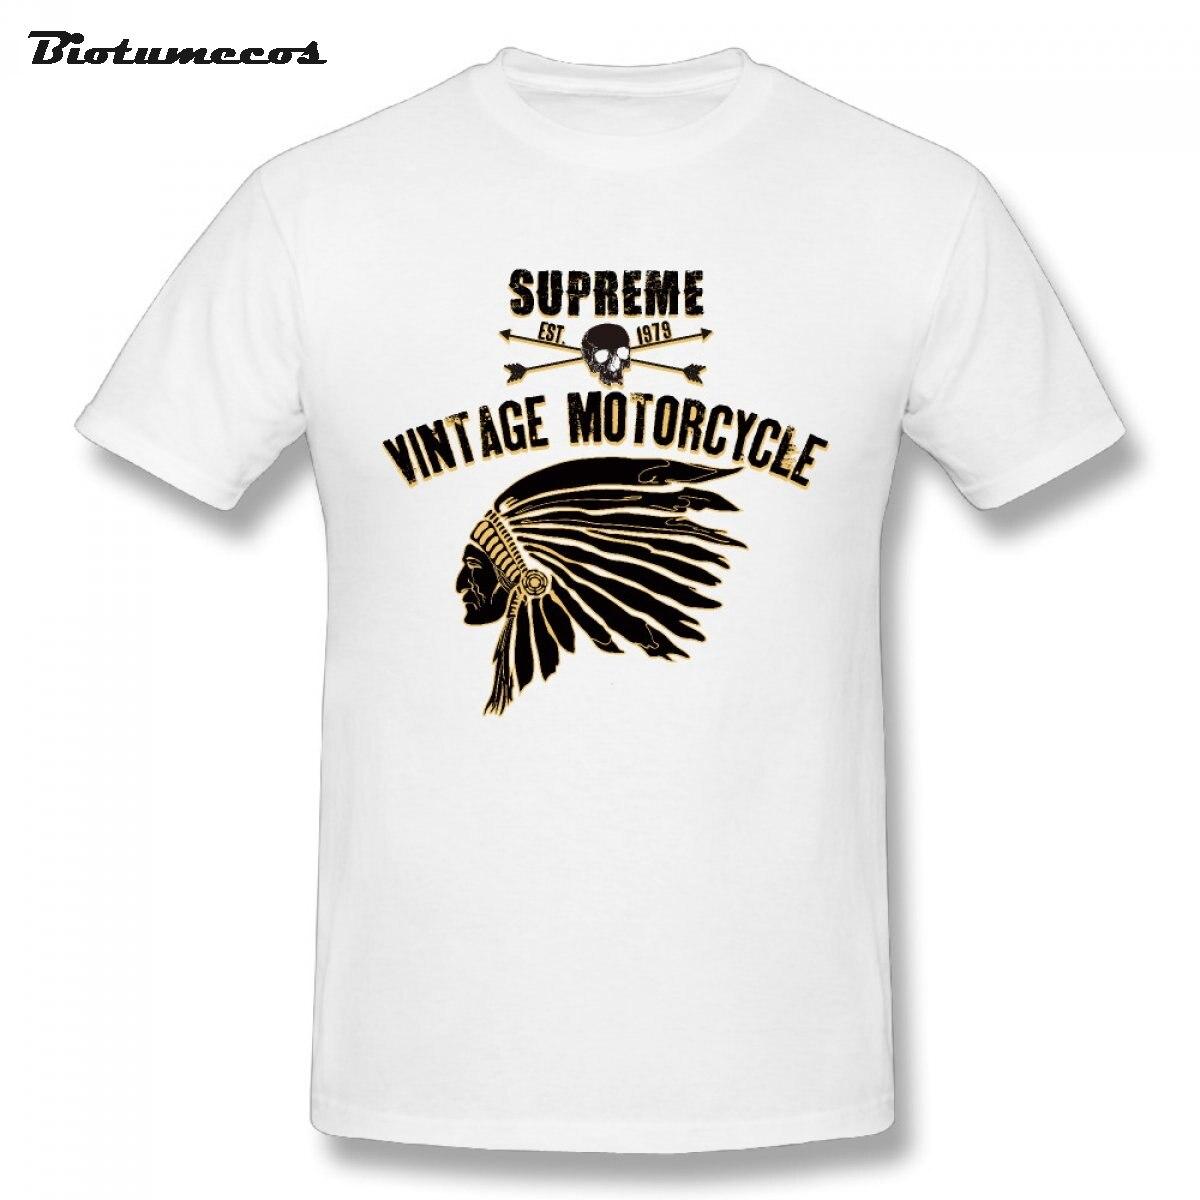 T Shirt Vintage Motorcycle Letter Tees Shirt Men CartoonT ...